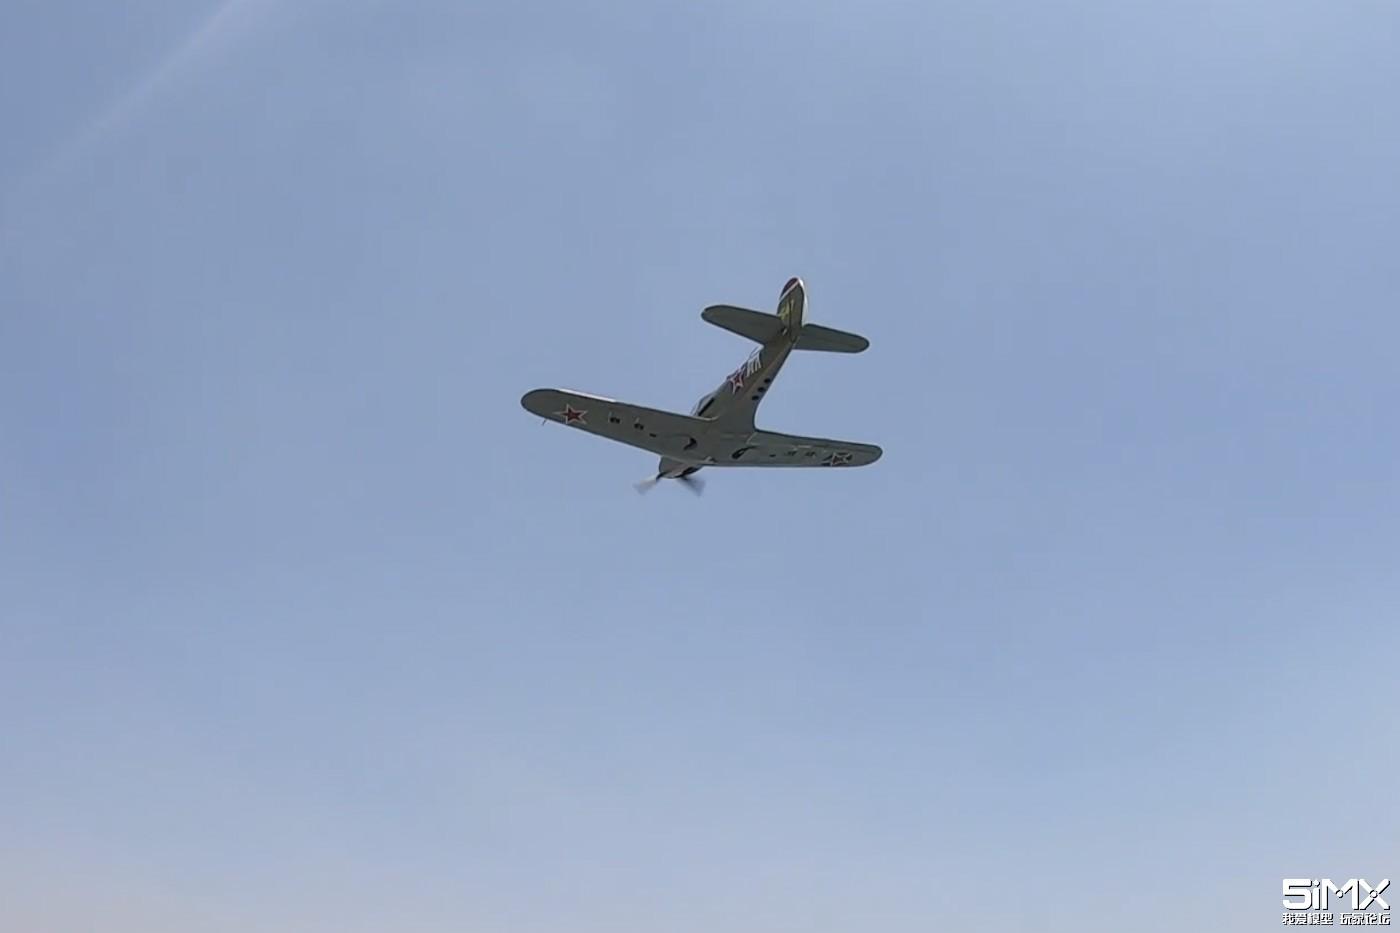 【ASHOBBY】二战传奇战机P-39测评!